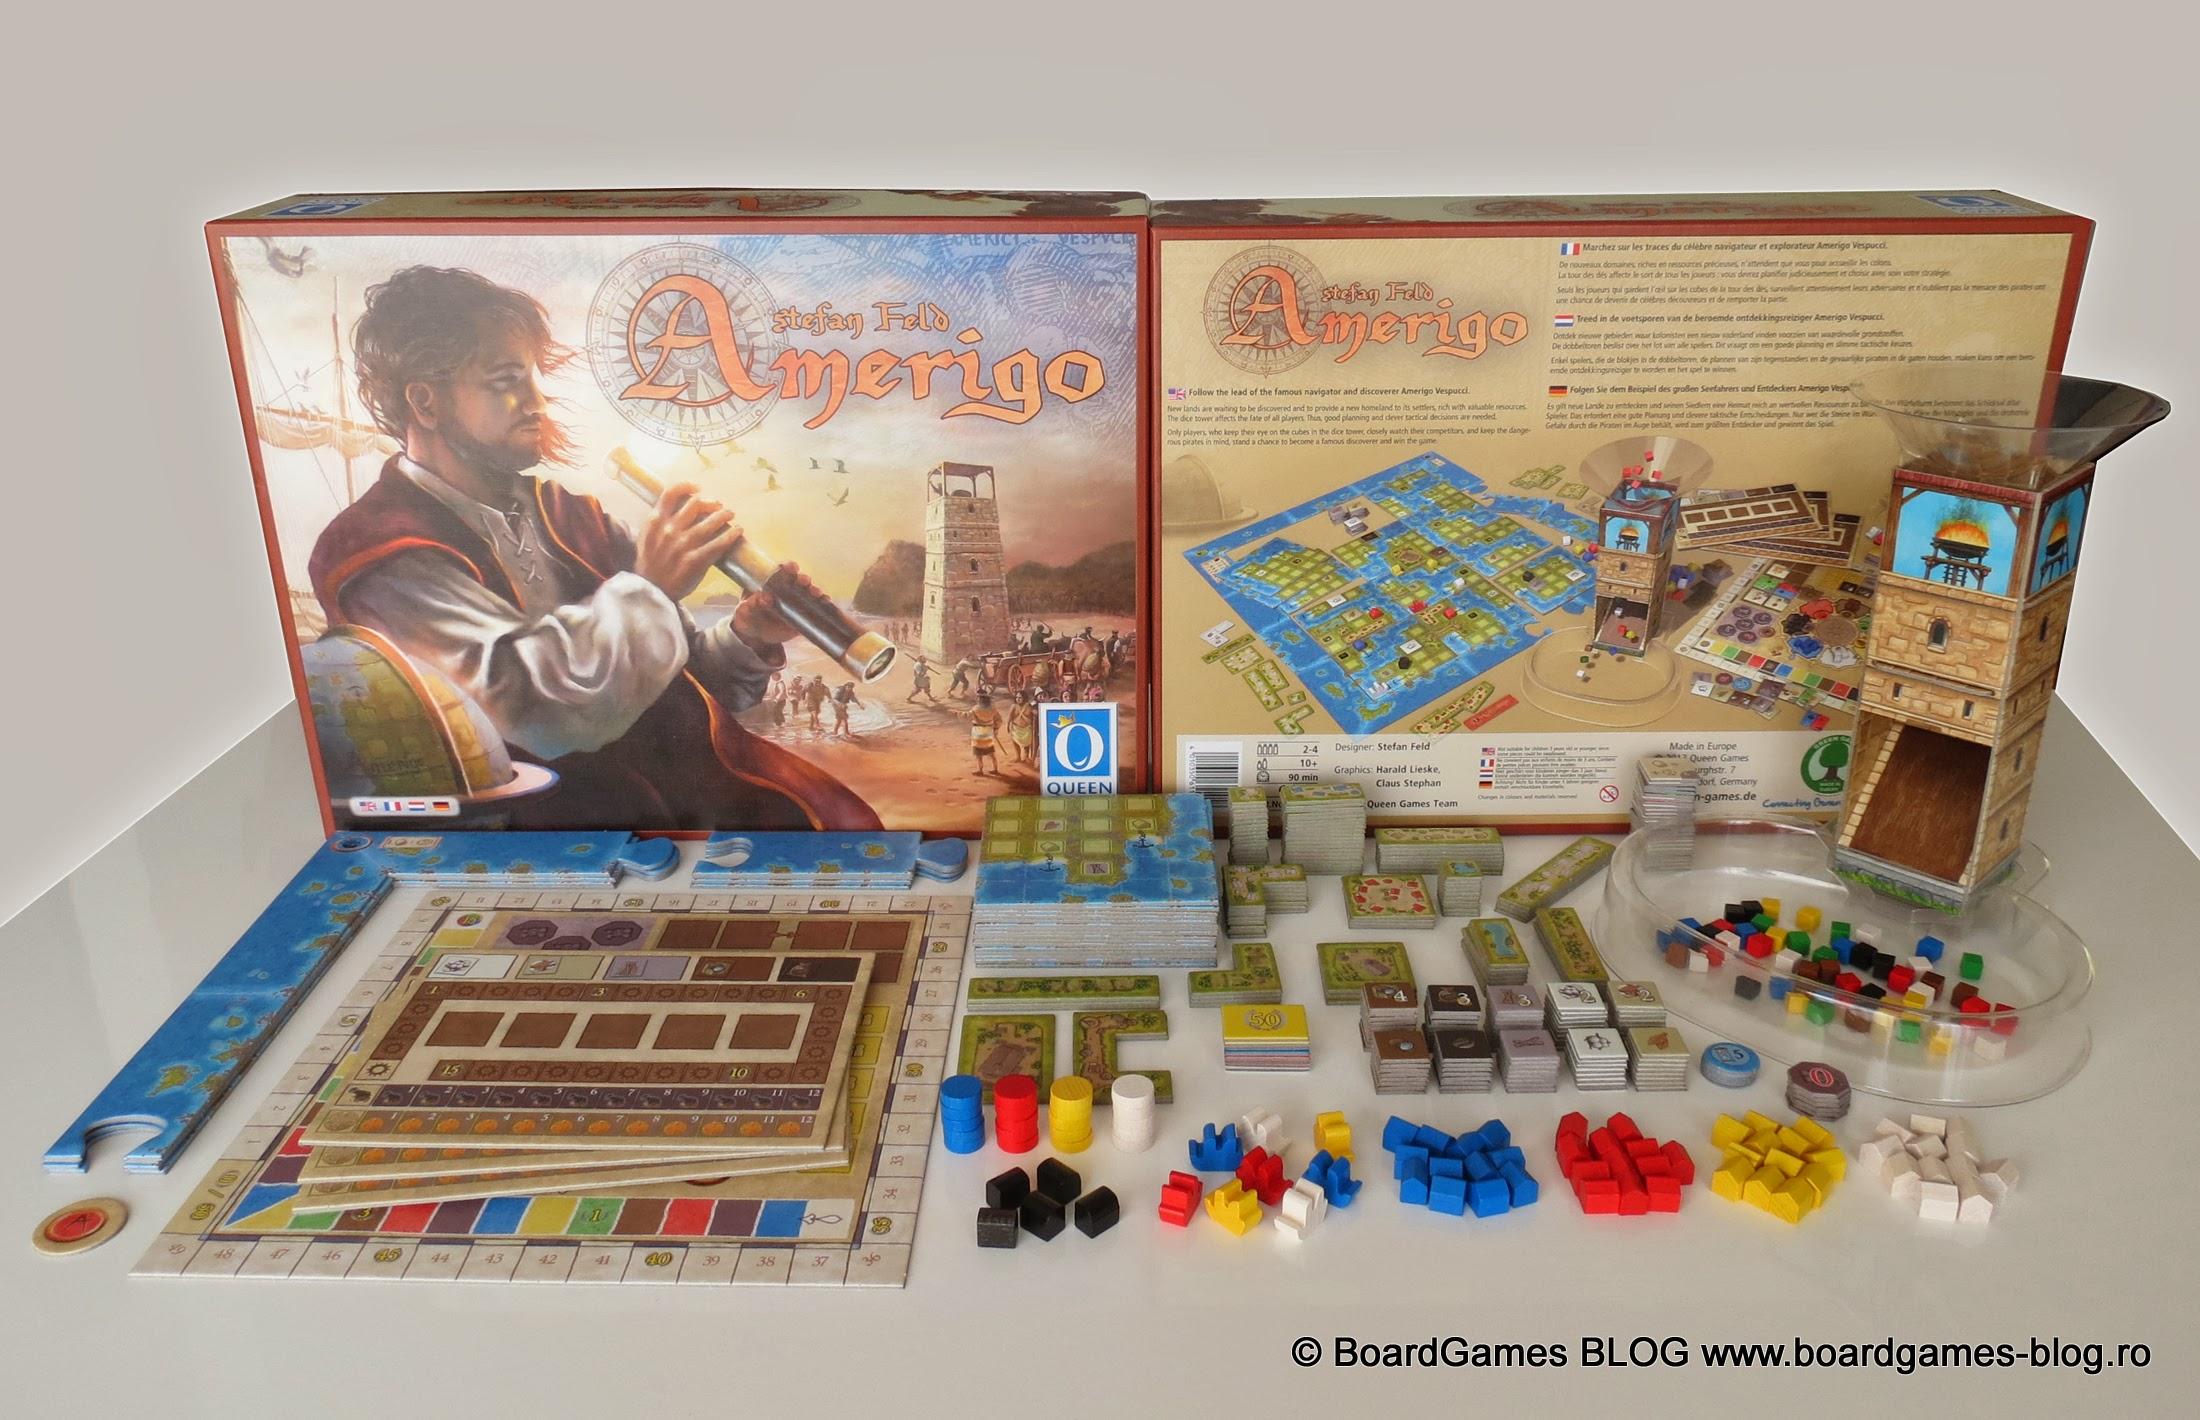 http://www.boardgames-blog.ro/wp-content/uploads/Amerigo-Prezentarea_detaliata_a_componentelor.jpg